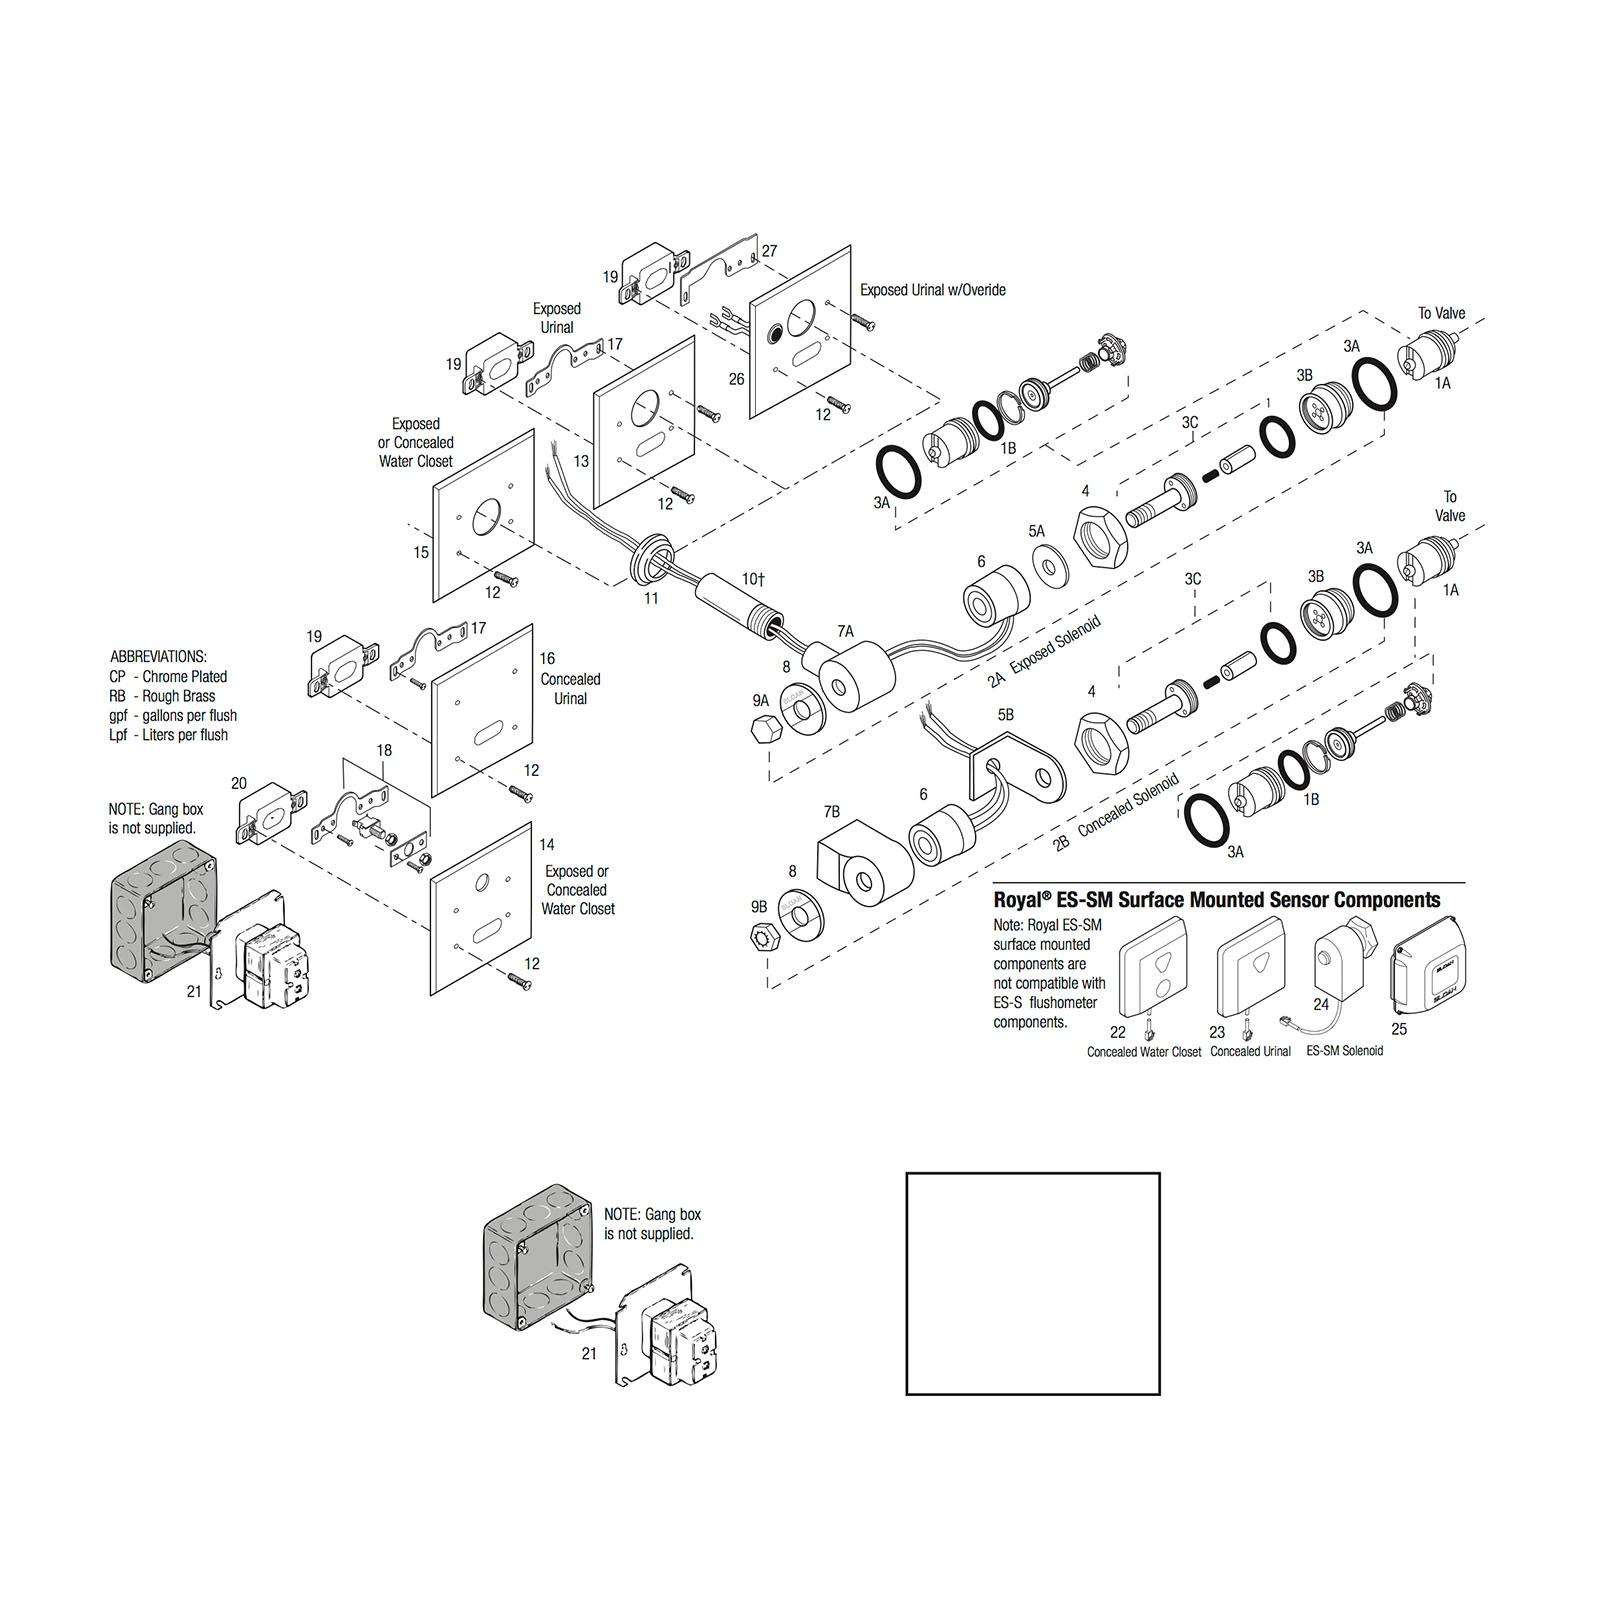 hight resolution of actuator cartridge assembly repair kit